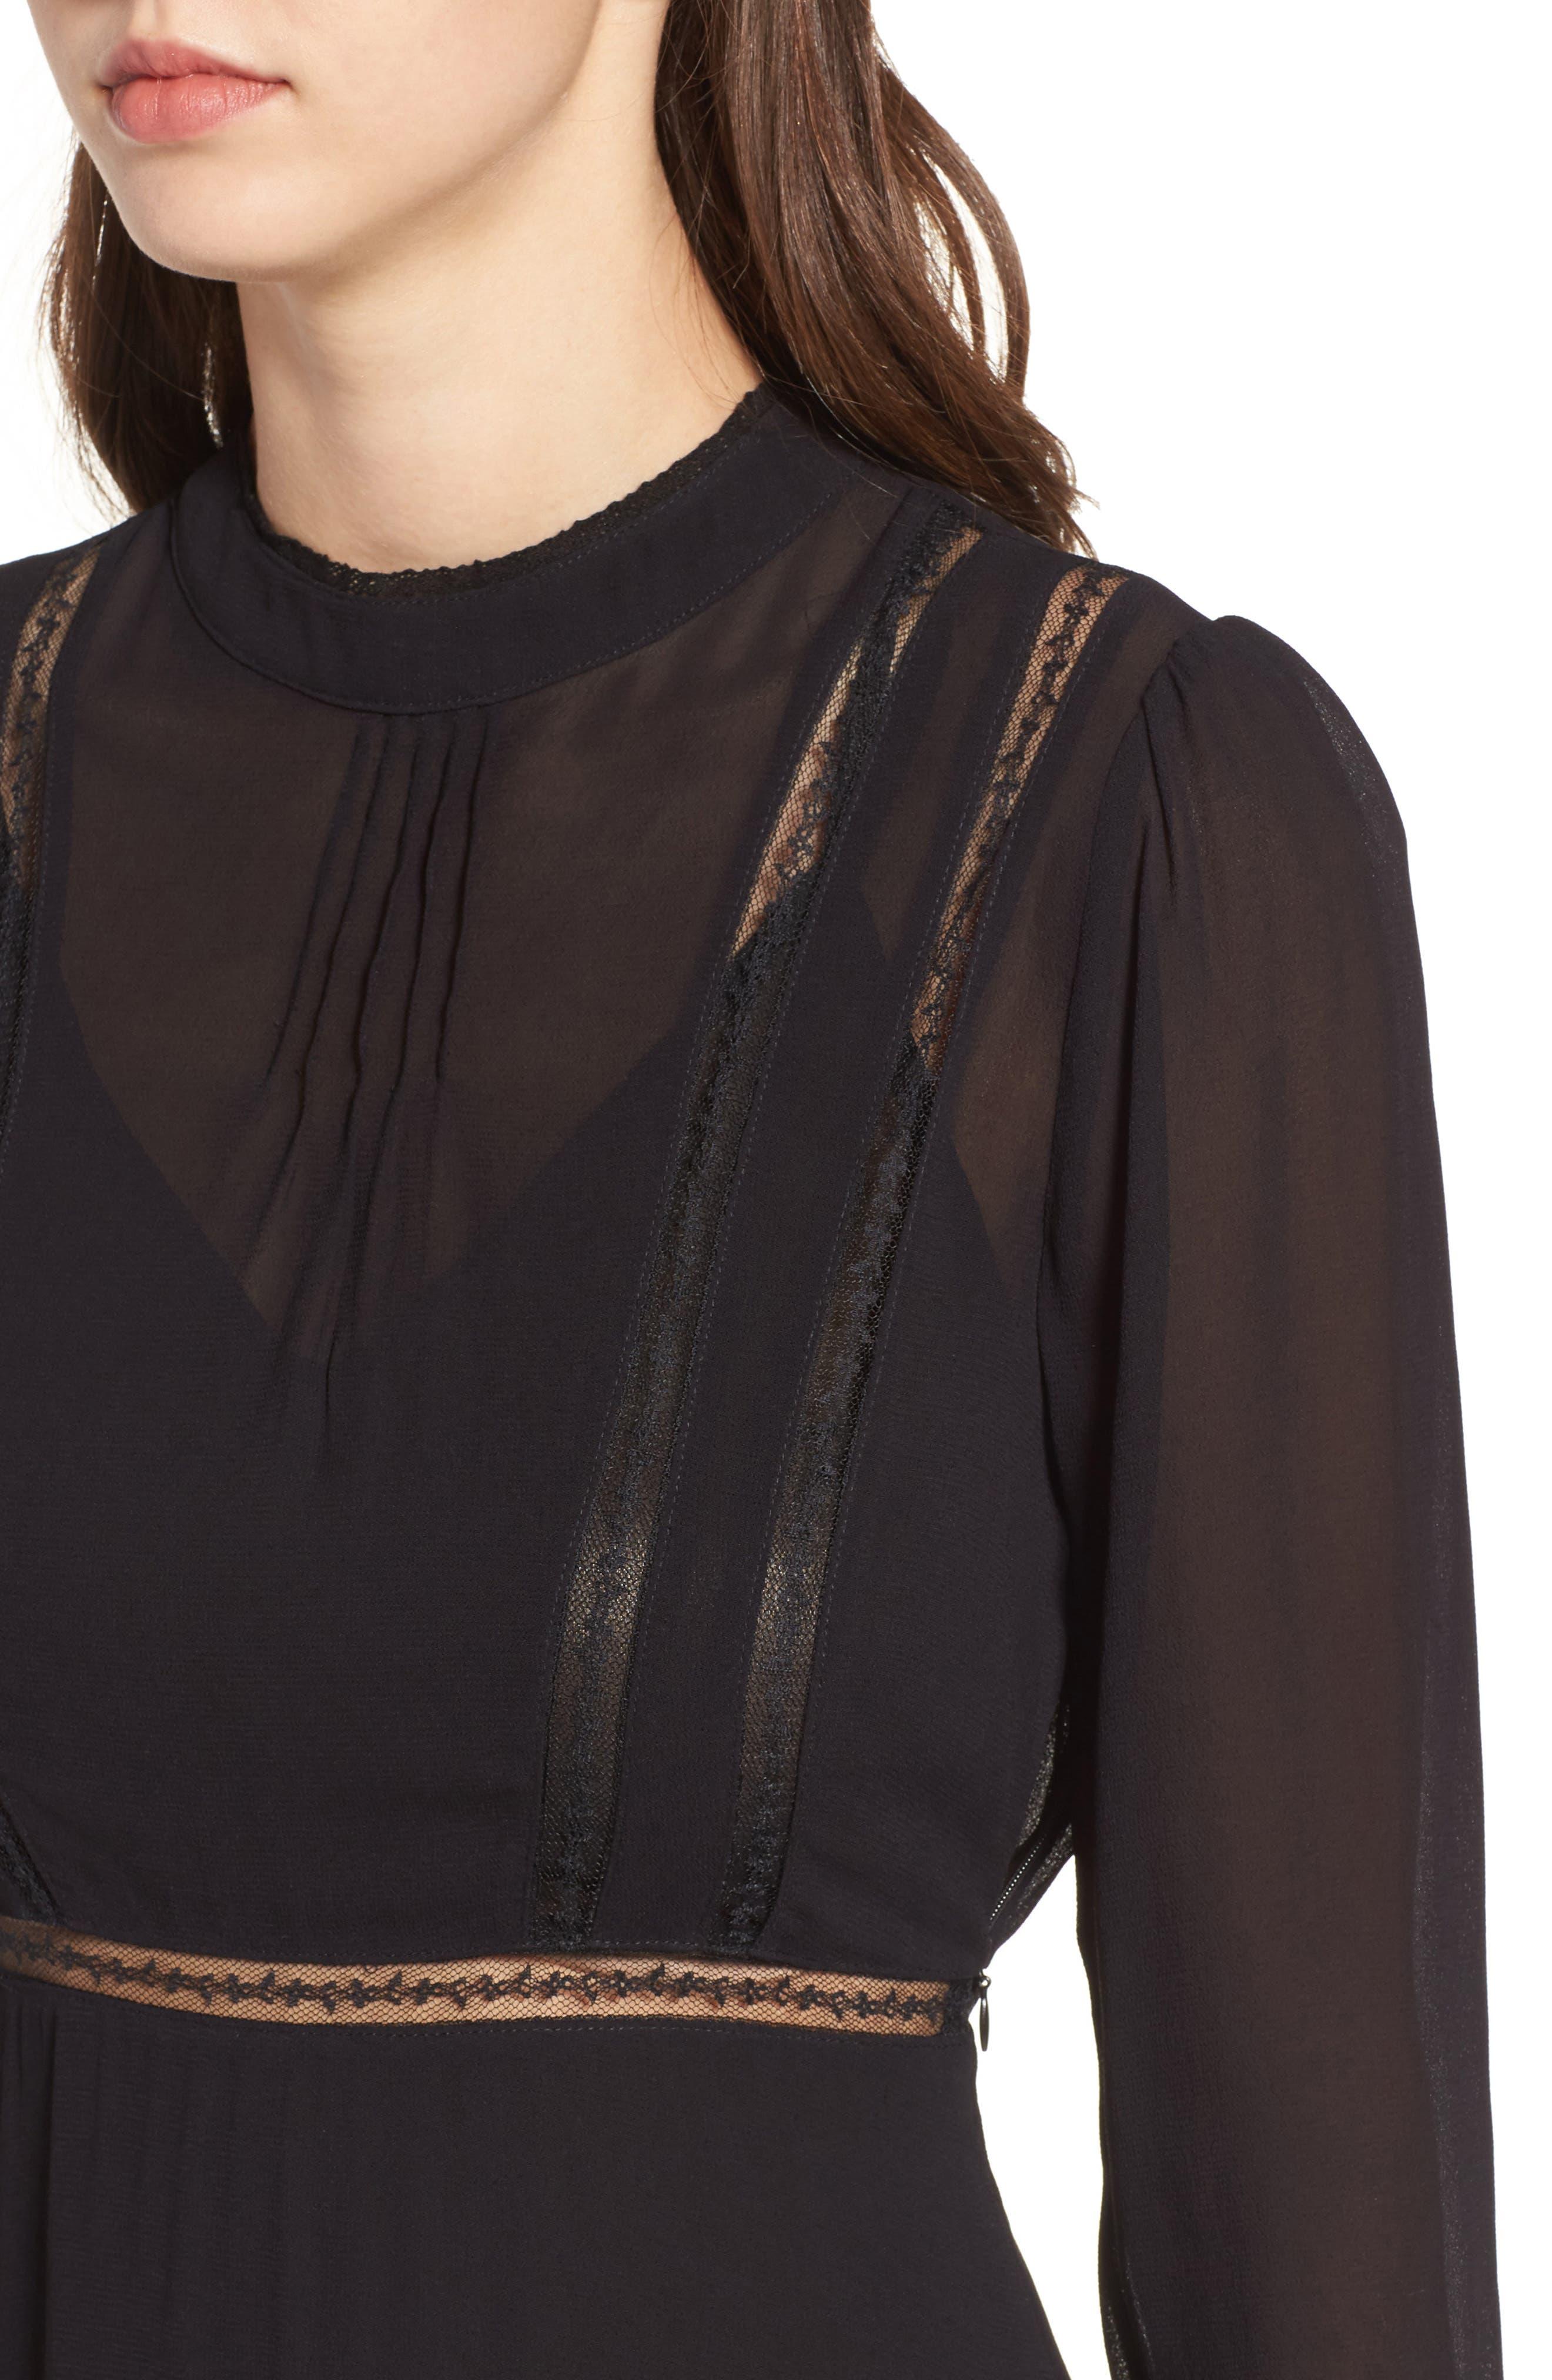 Kirsten A-Line Dress,                             Alternate thumbnail 4, color,                             Black